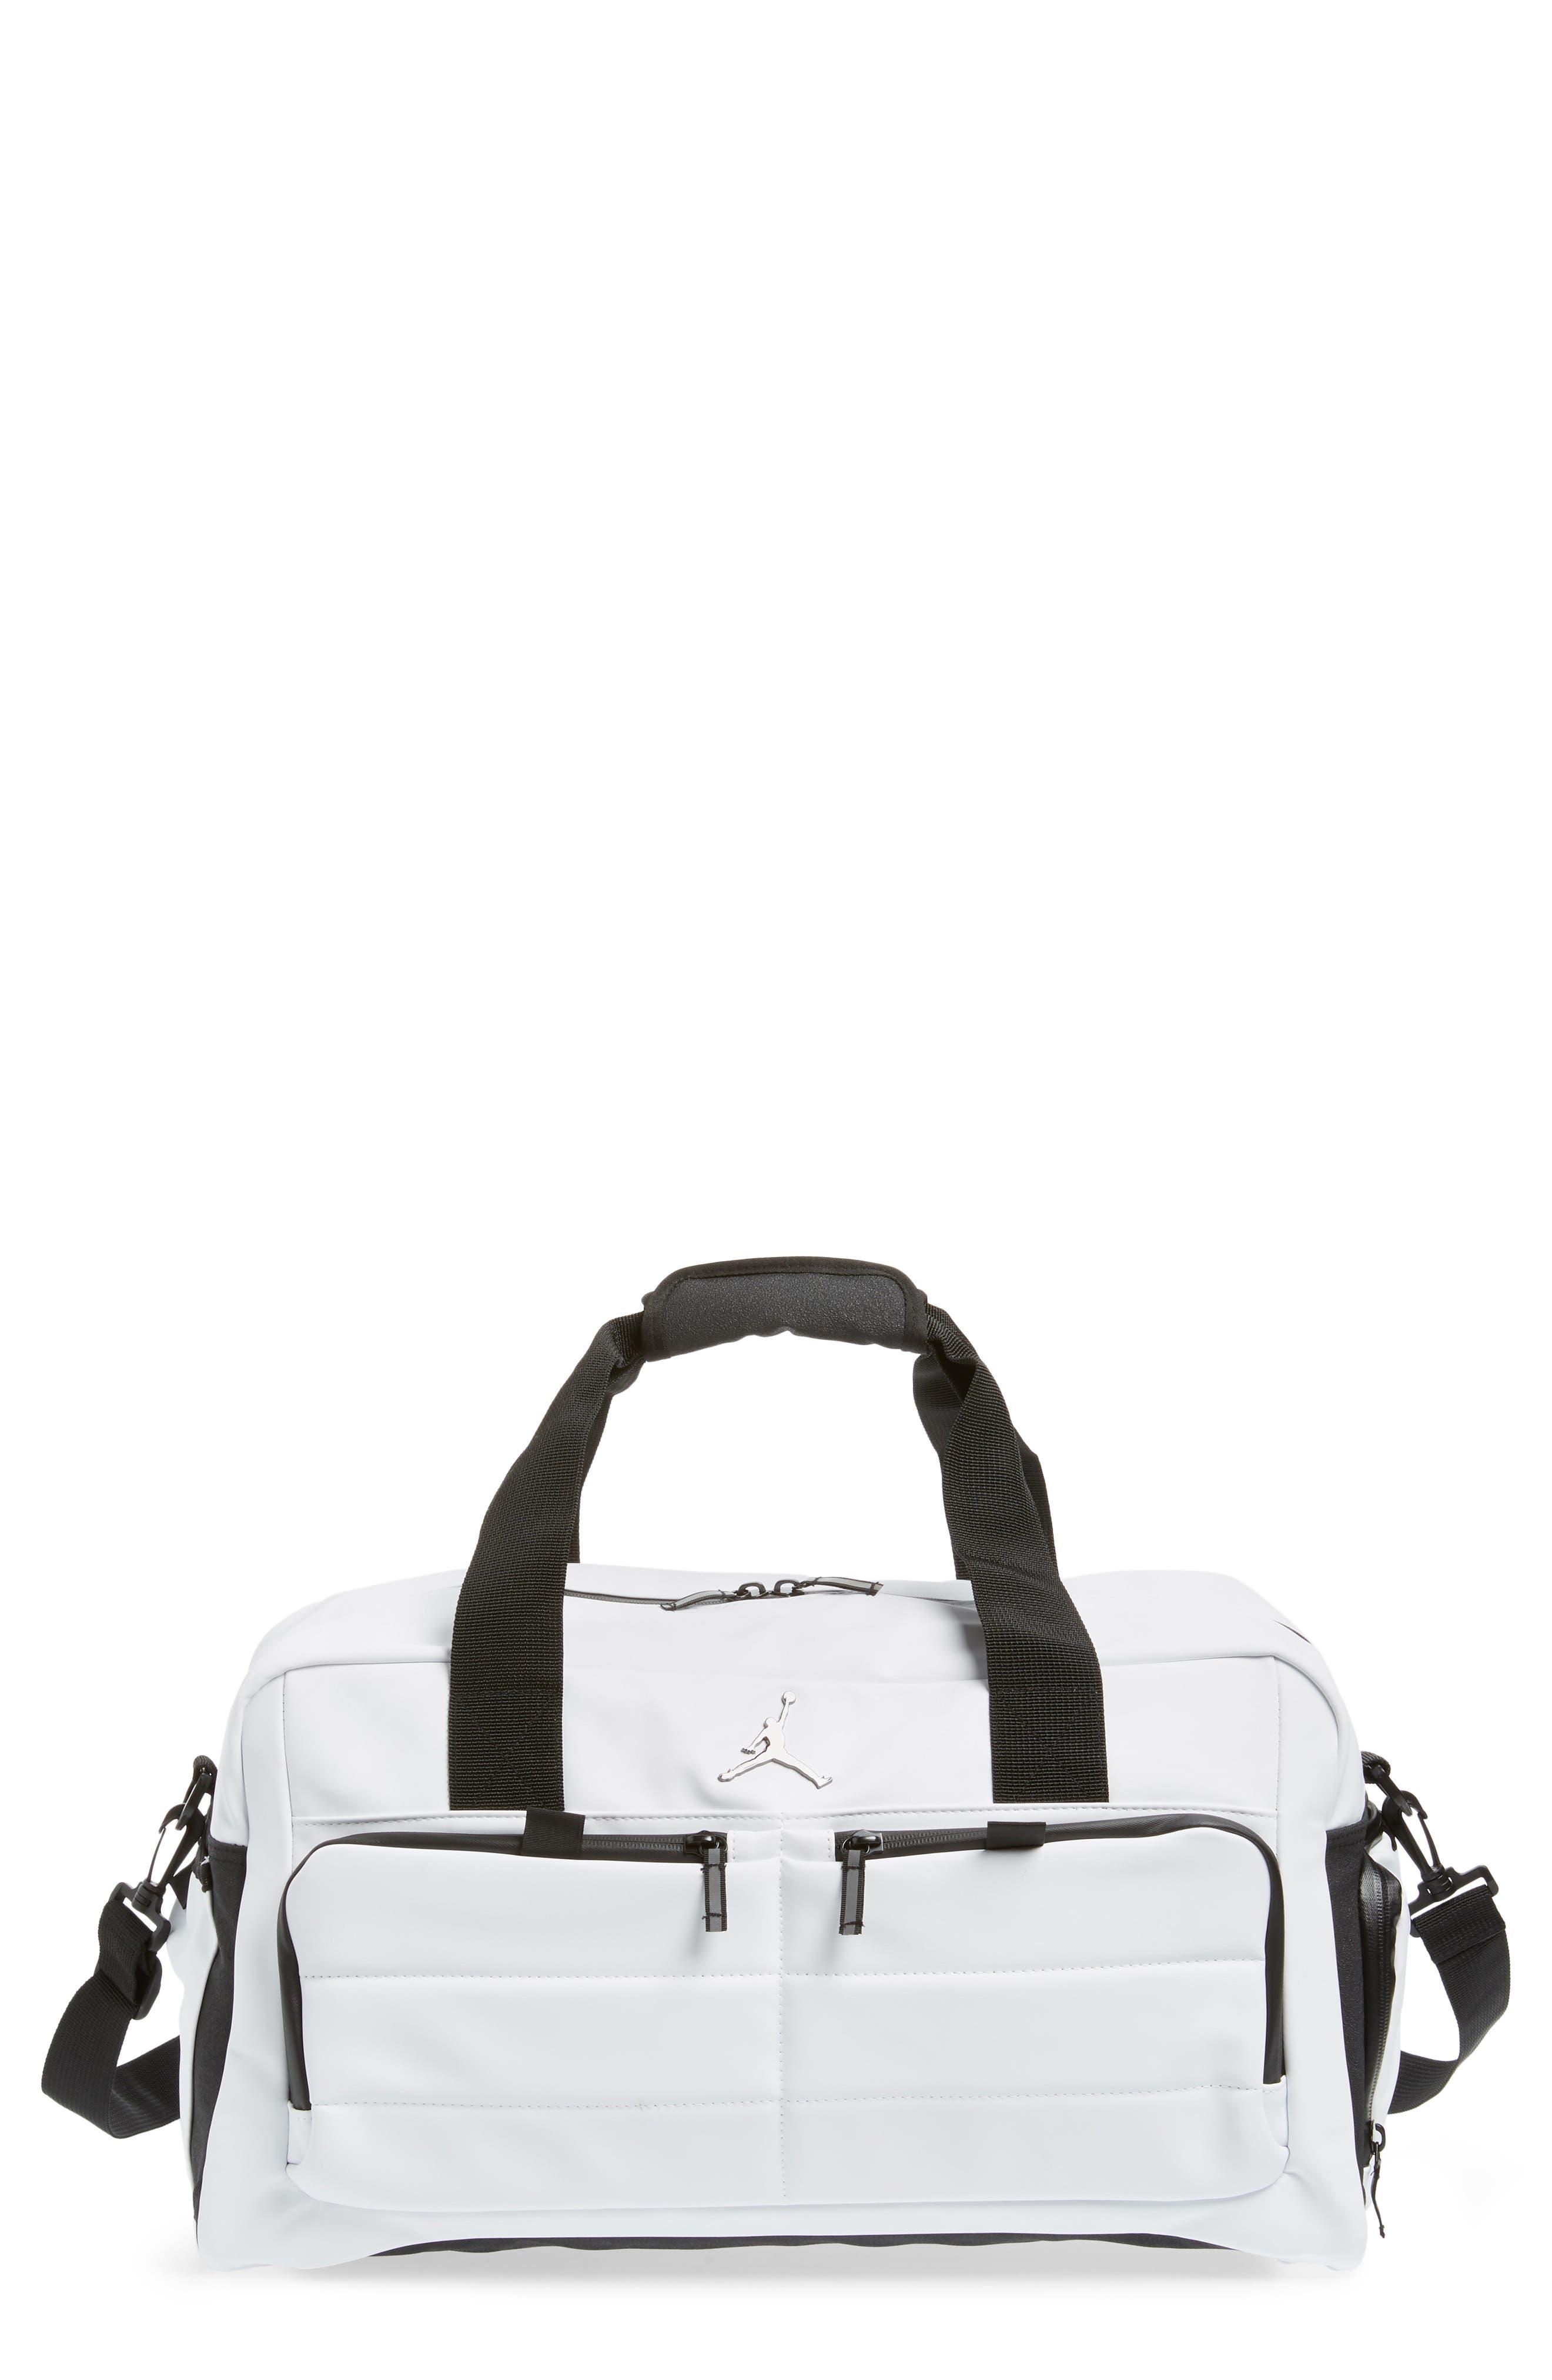 Jordan All World Edition Duffel Bag,                         Main,                         color, 100